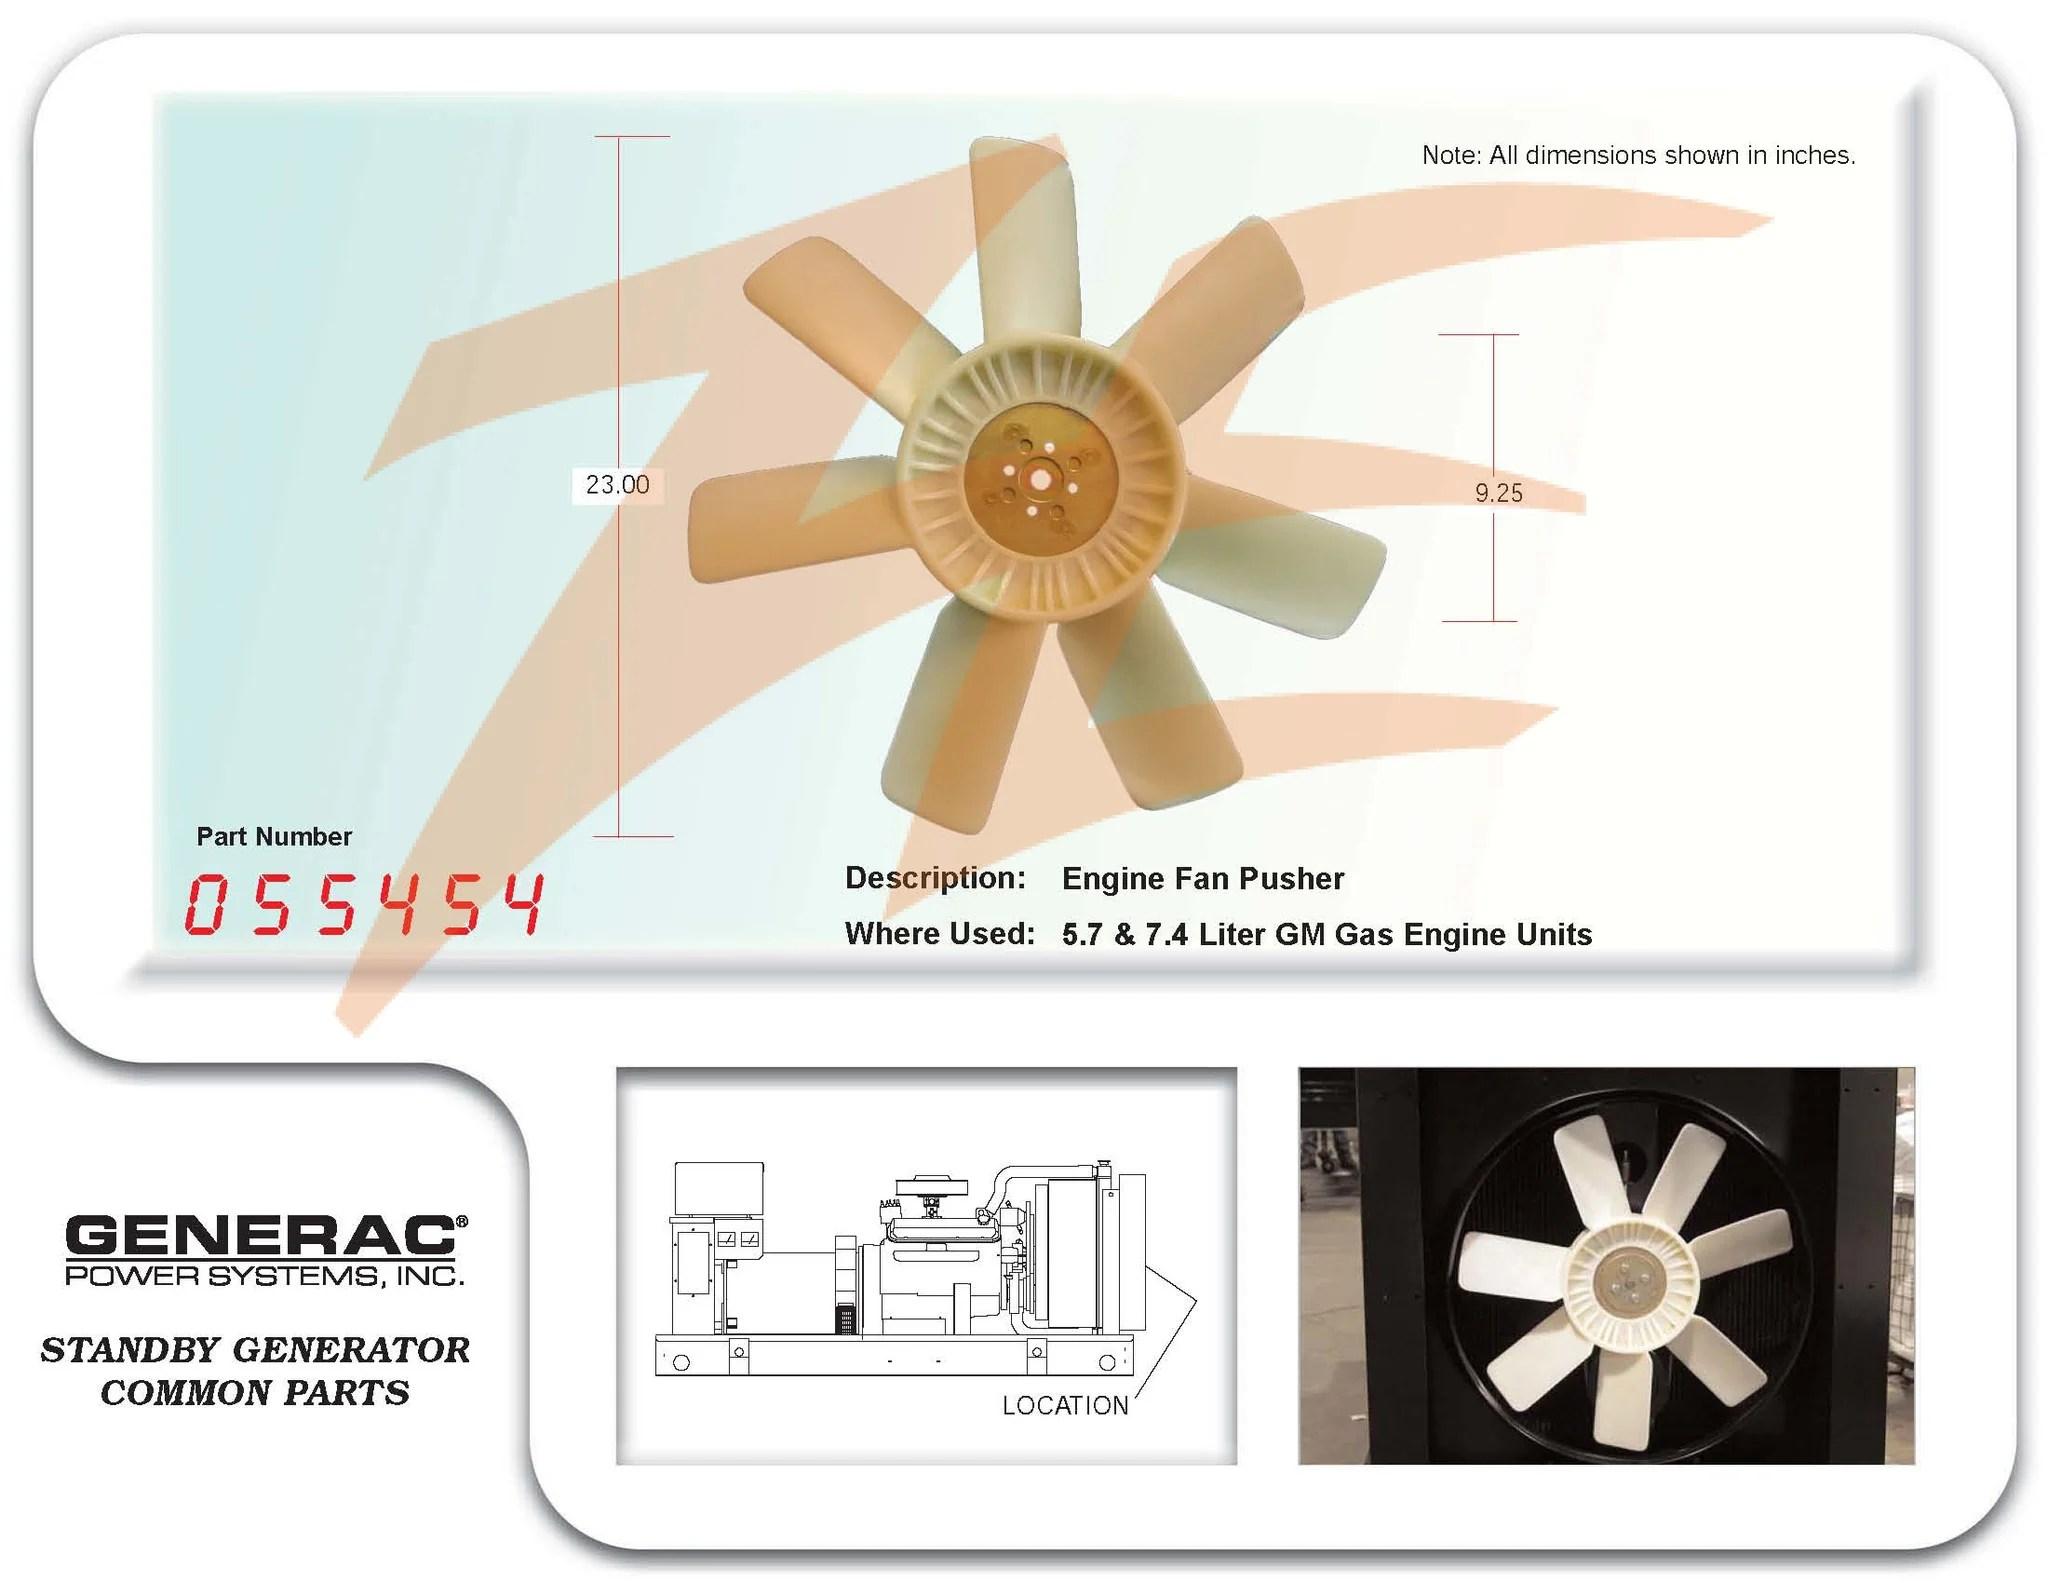 generac 055454 engine cooling fan pusher 5 7 7 4l [ 2048 x 1583 Pixel ]